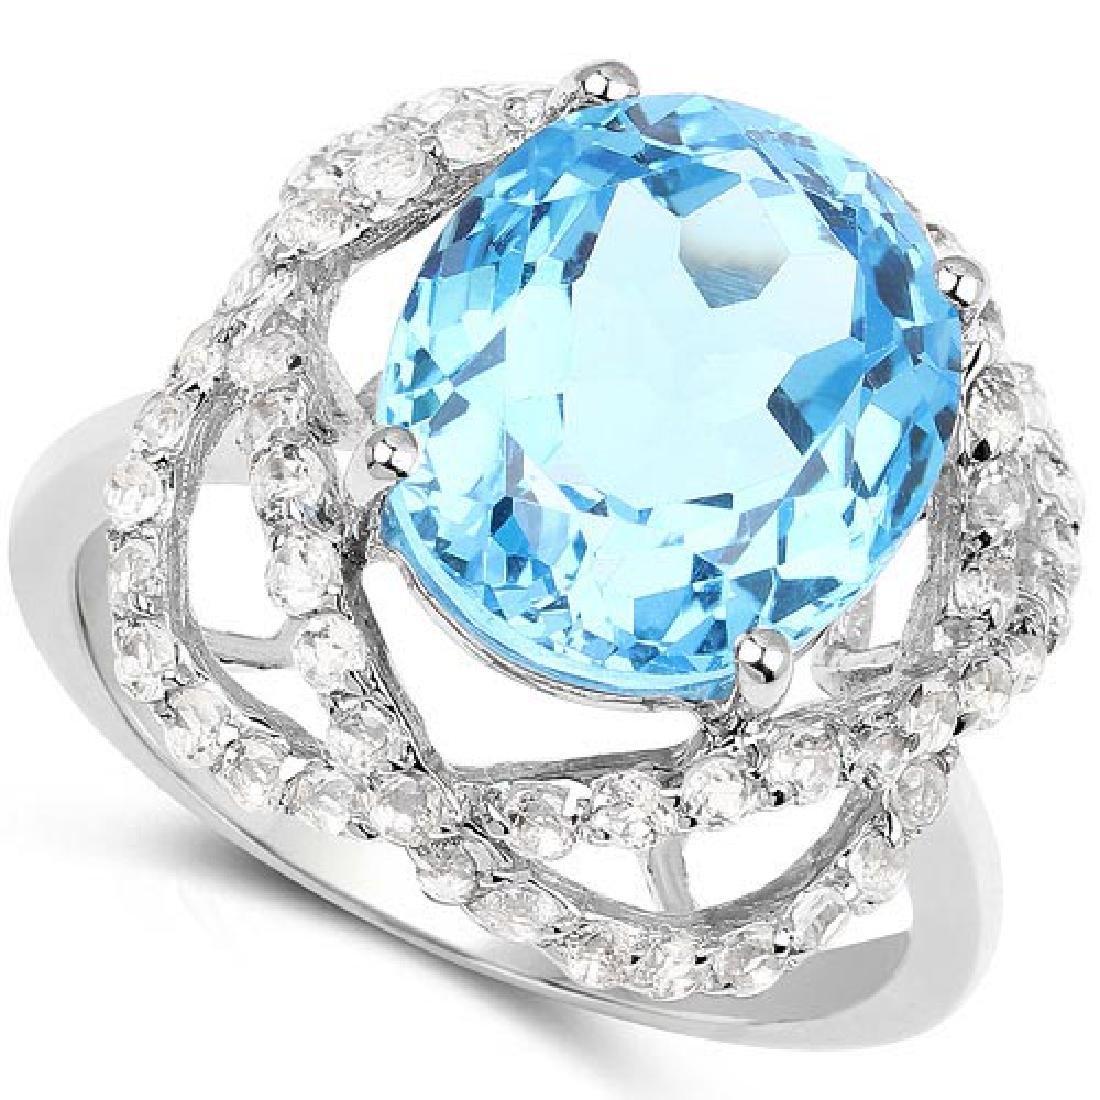 Certified 1.80 Ctw.Genuine Aquamarine And Diamond 14K w